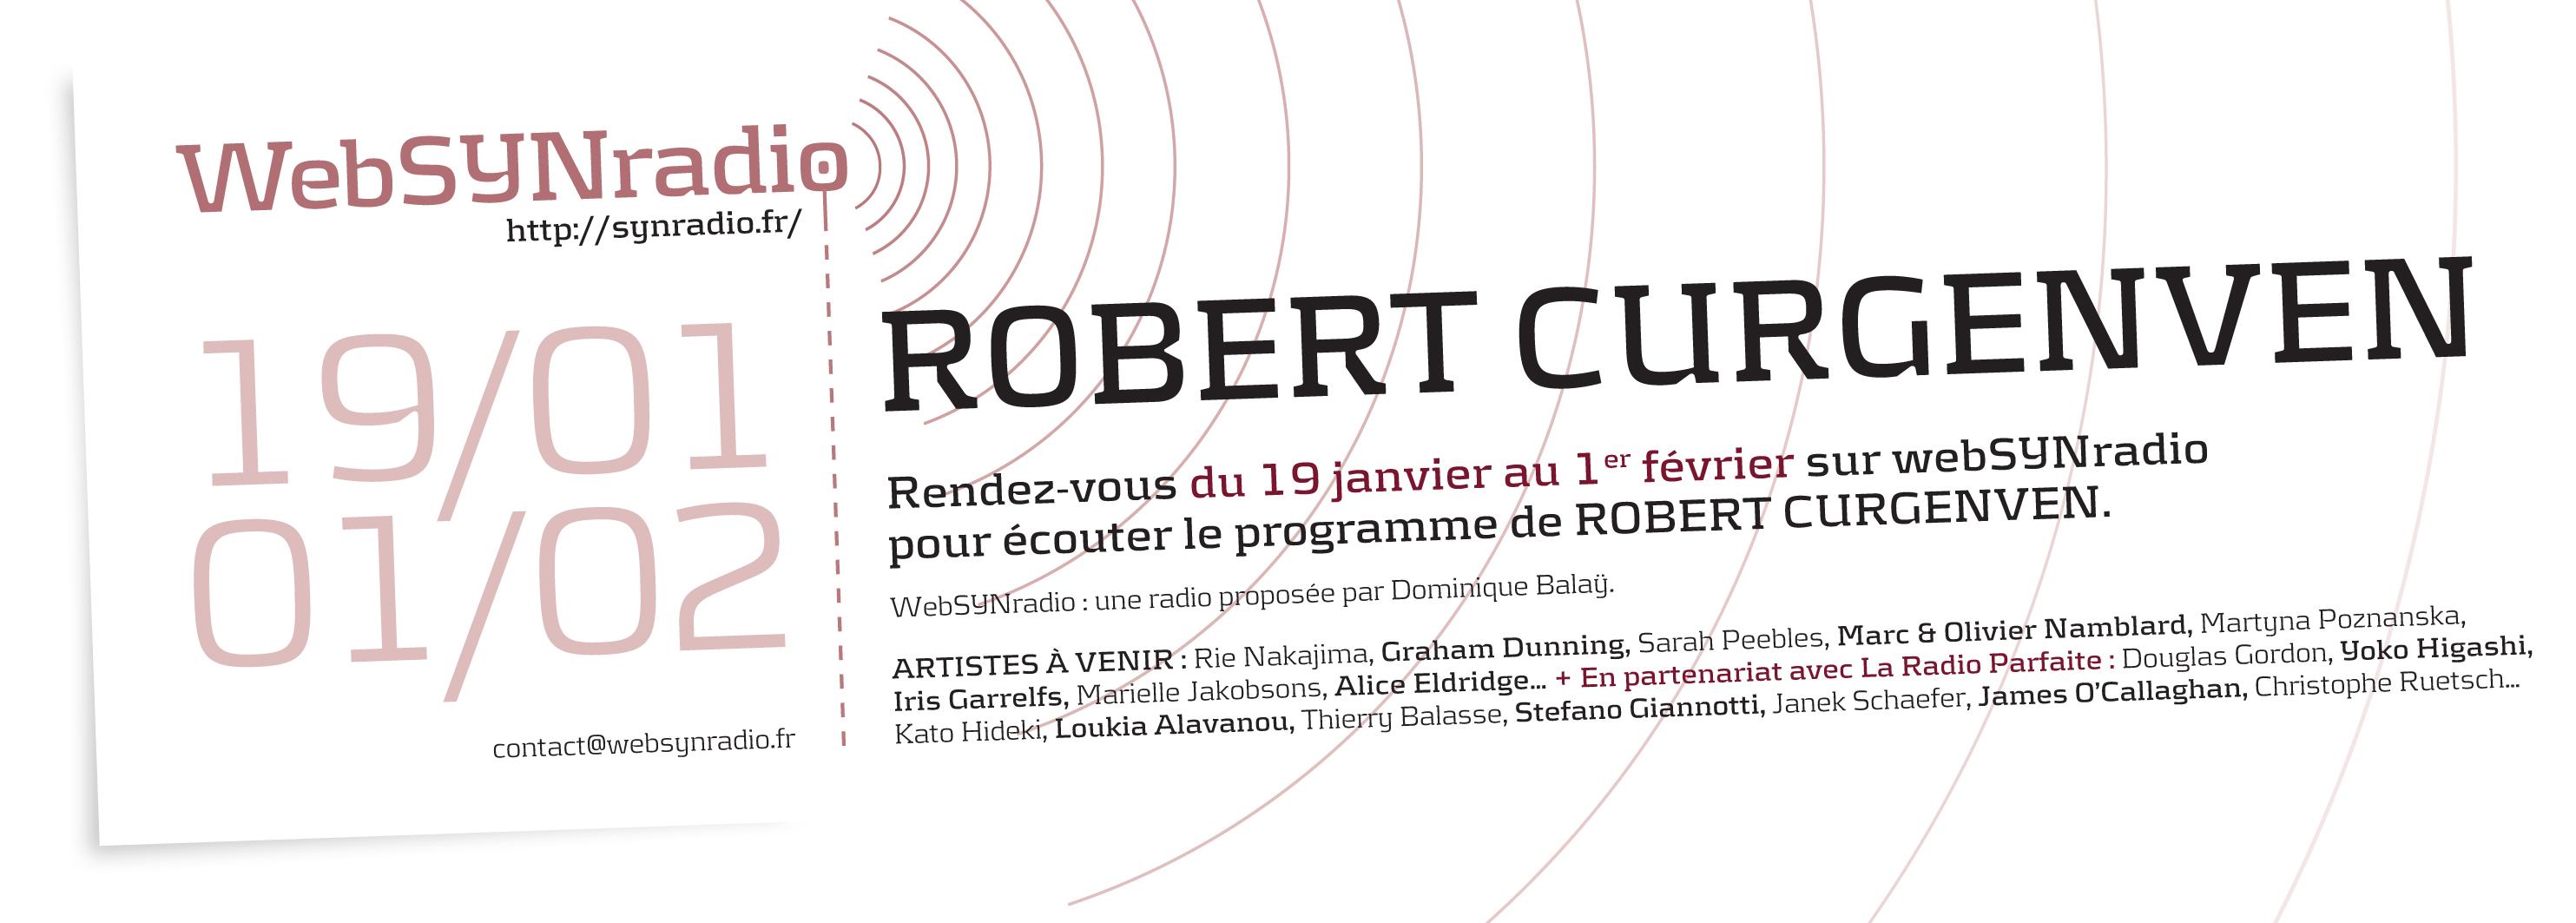 Robert Curgenven websynradio